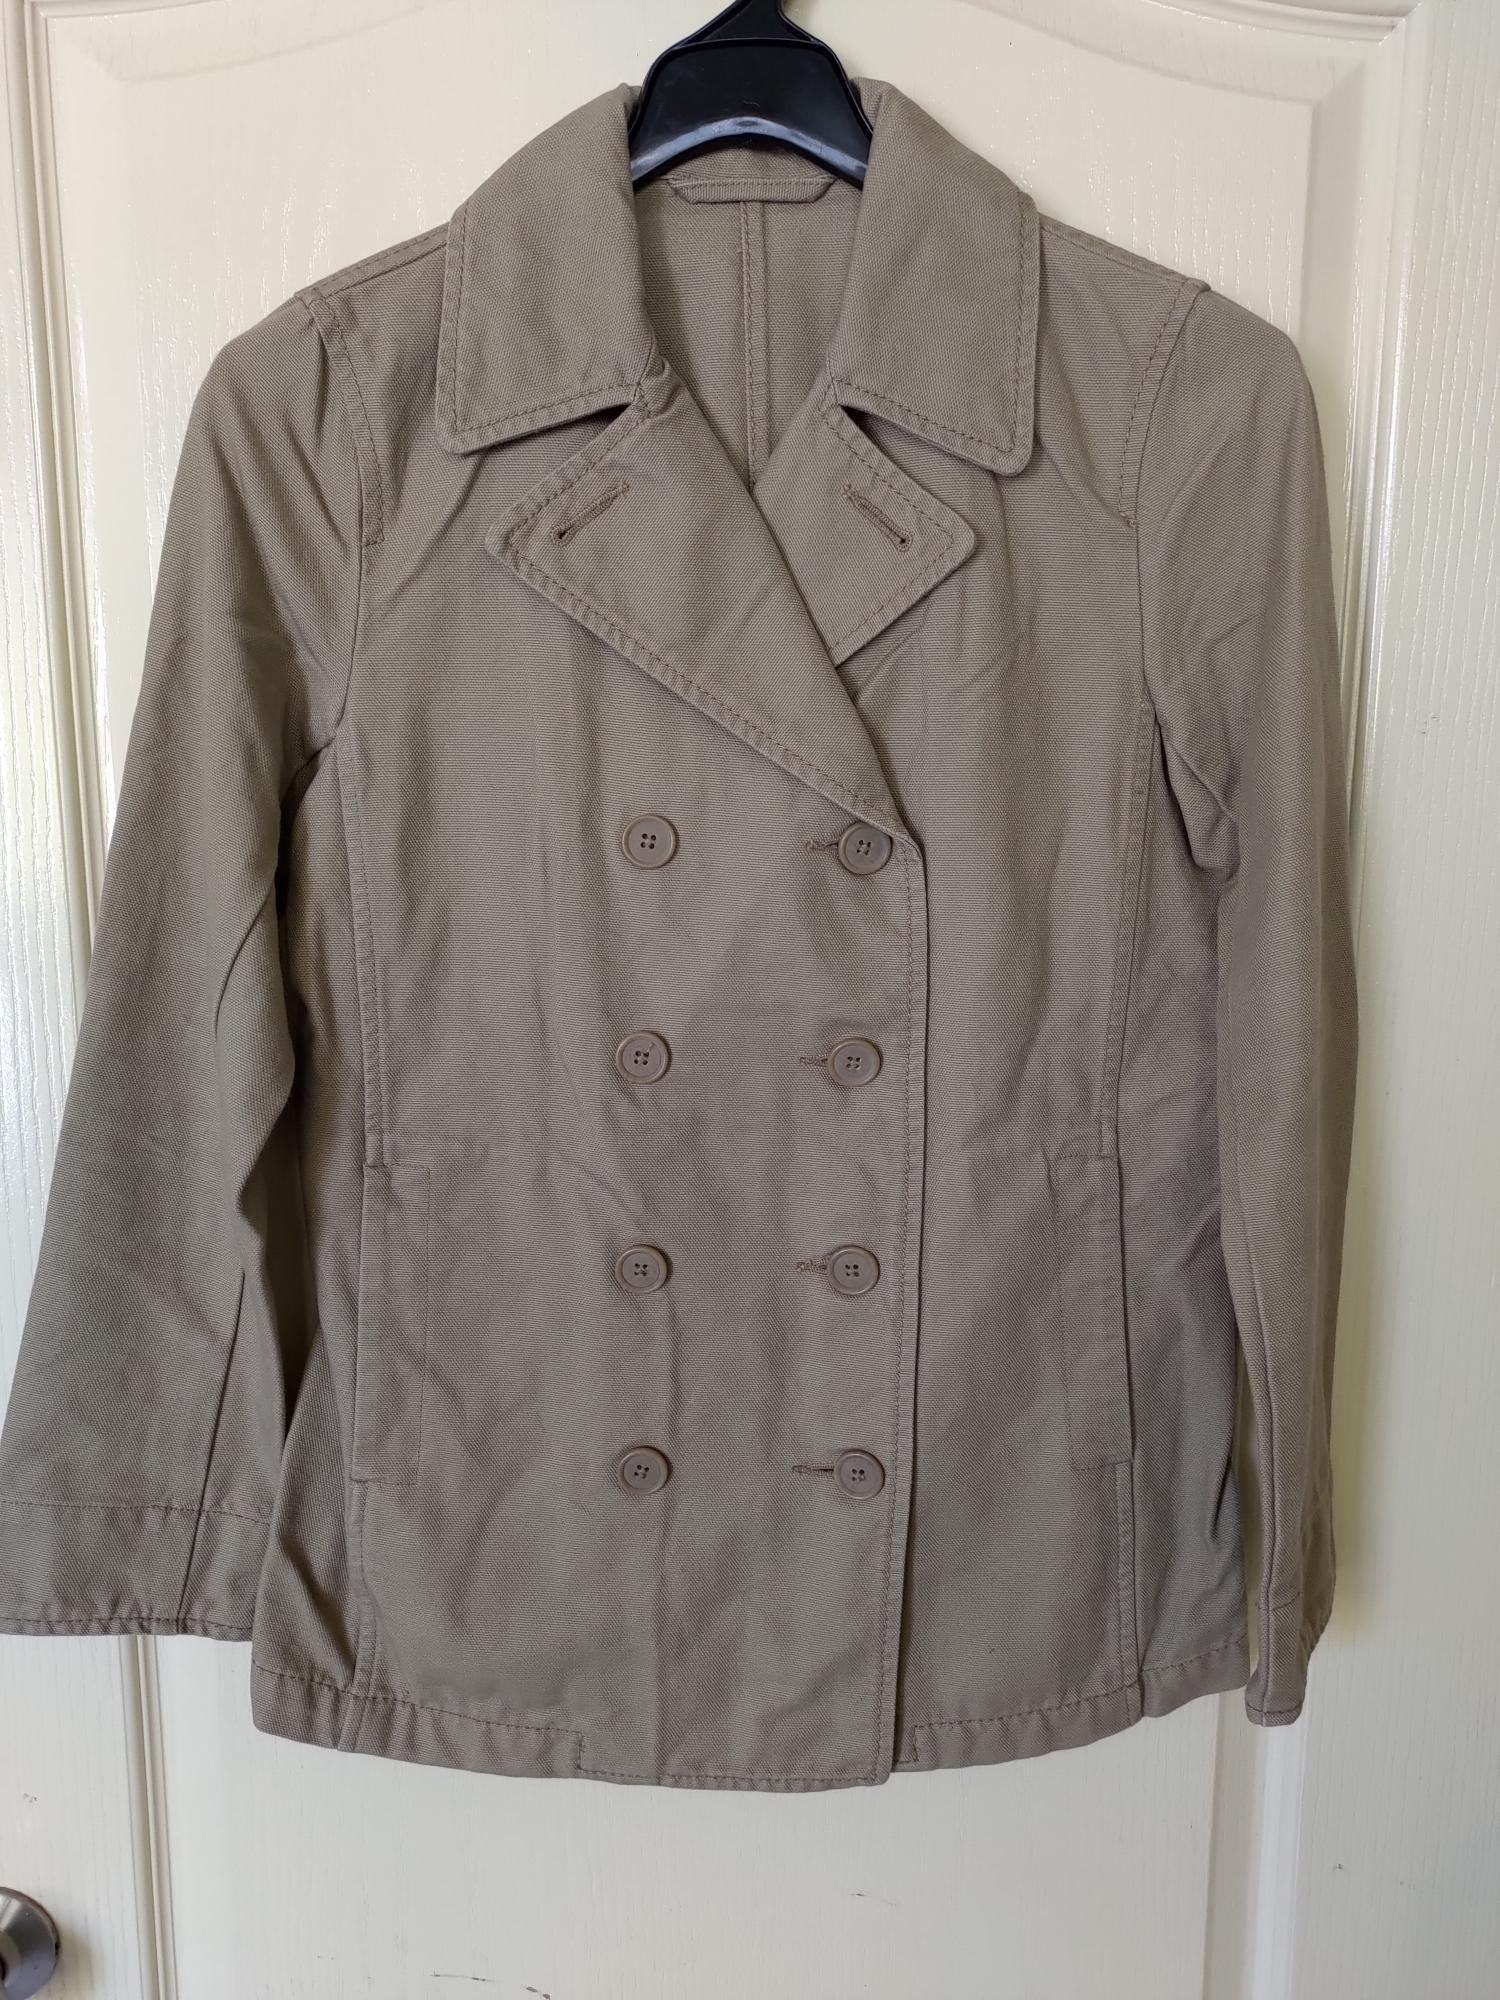 [99go] 日本 無印良品專櫃 大地色系 短版 類牛仔布風衣 外套 S號 越南製